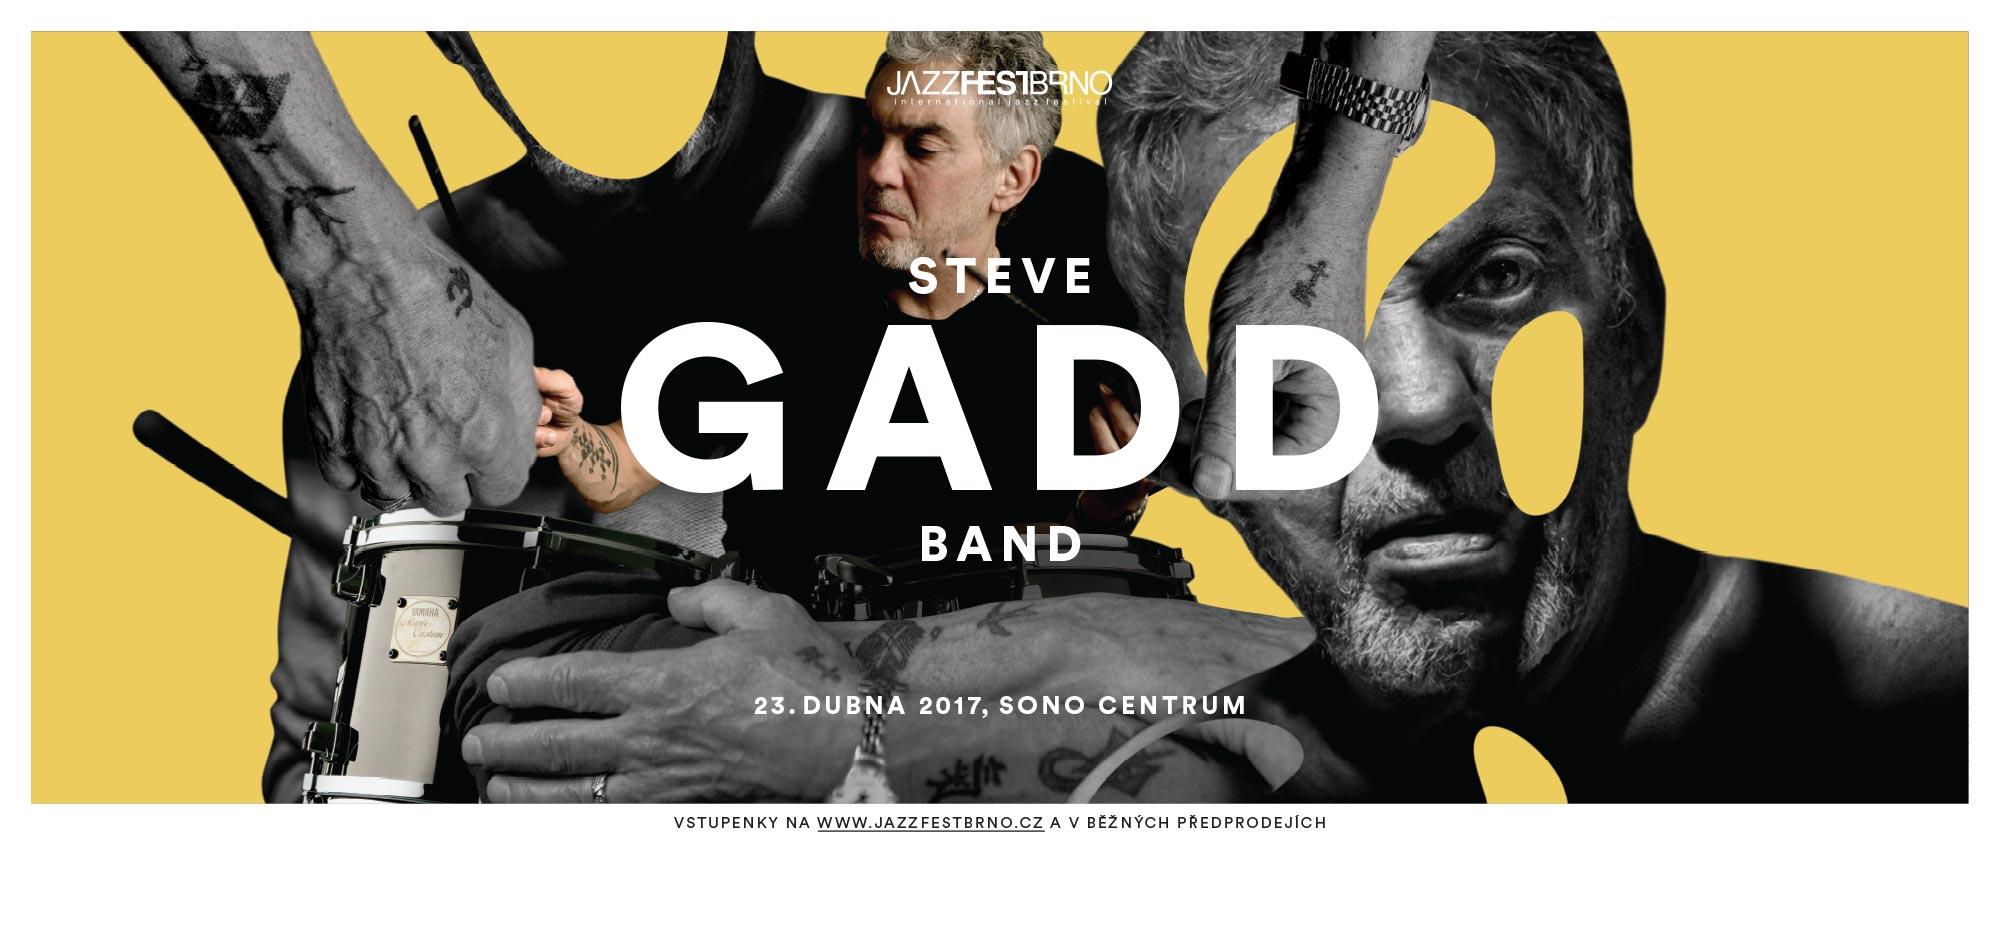 Jazzfestbrno 2017 - Steve Gadd